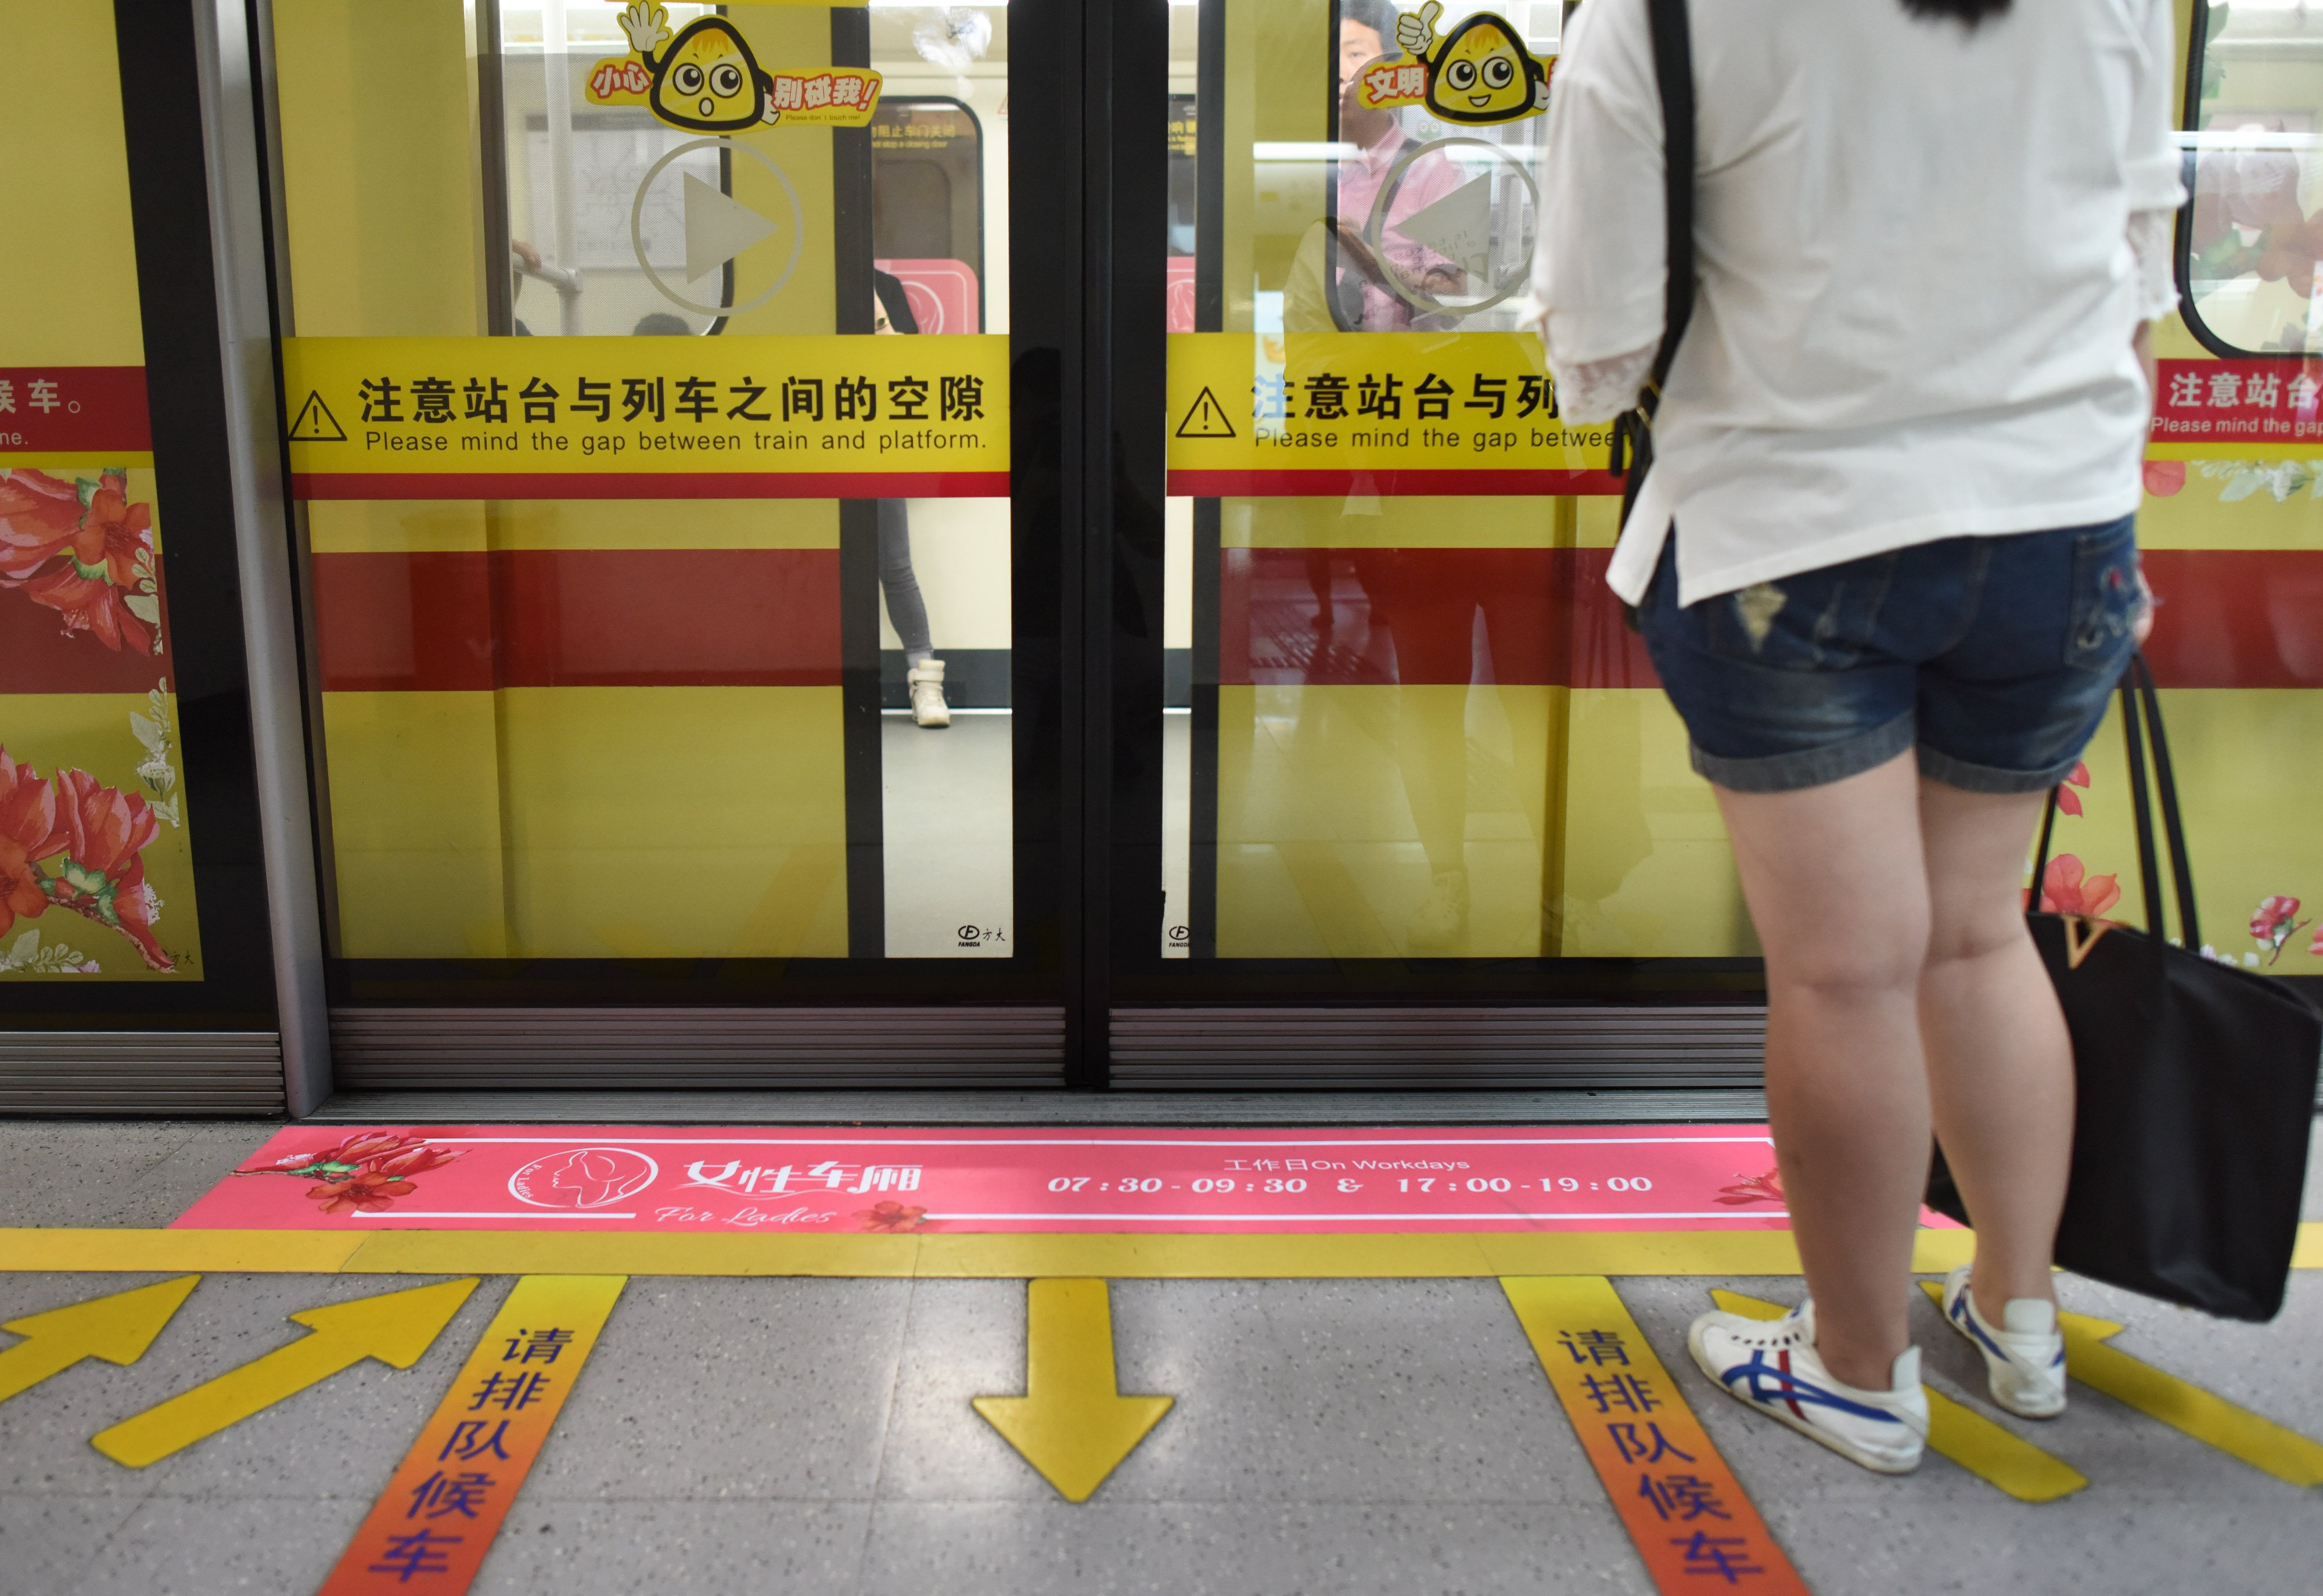 Corte de Shanghai sentencia a acosador en metro